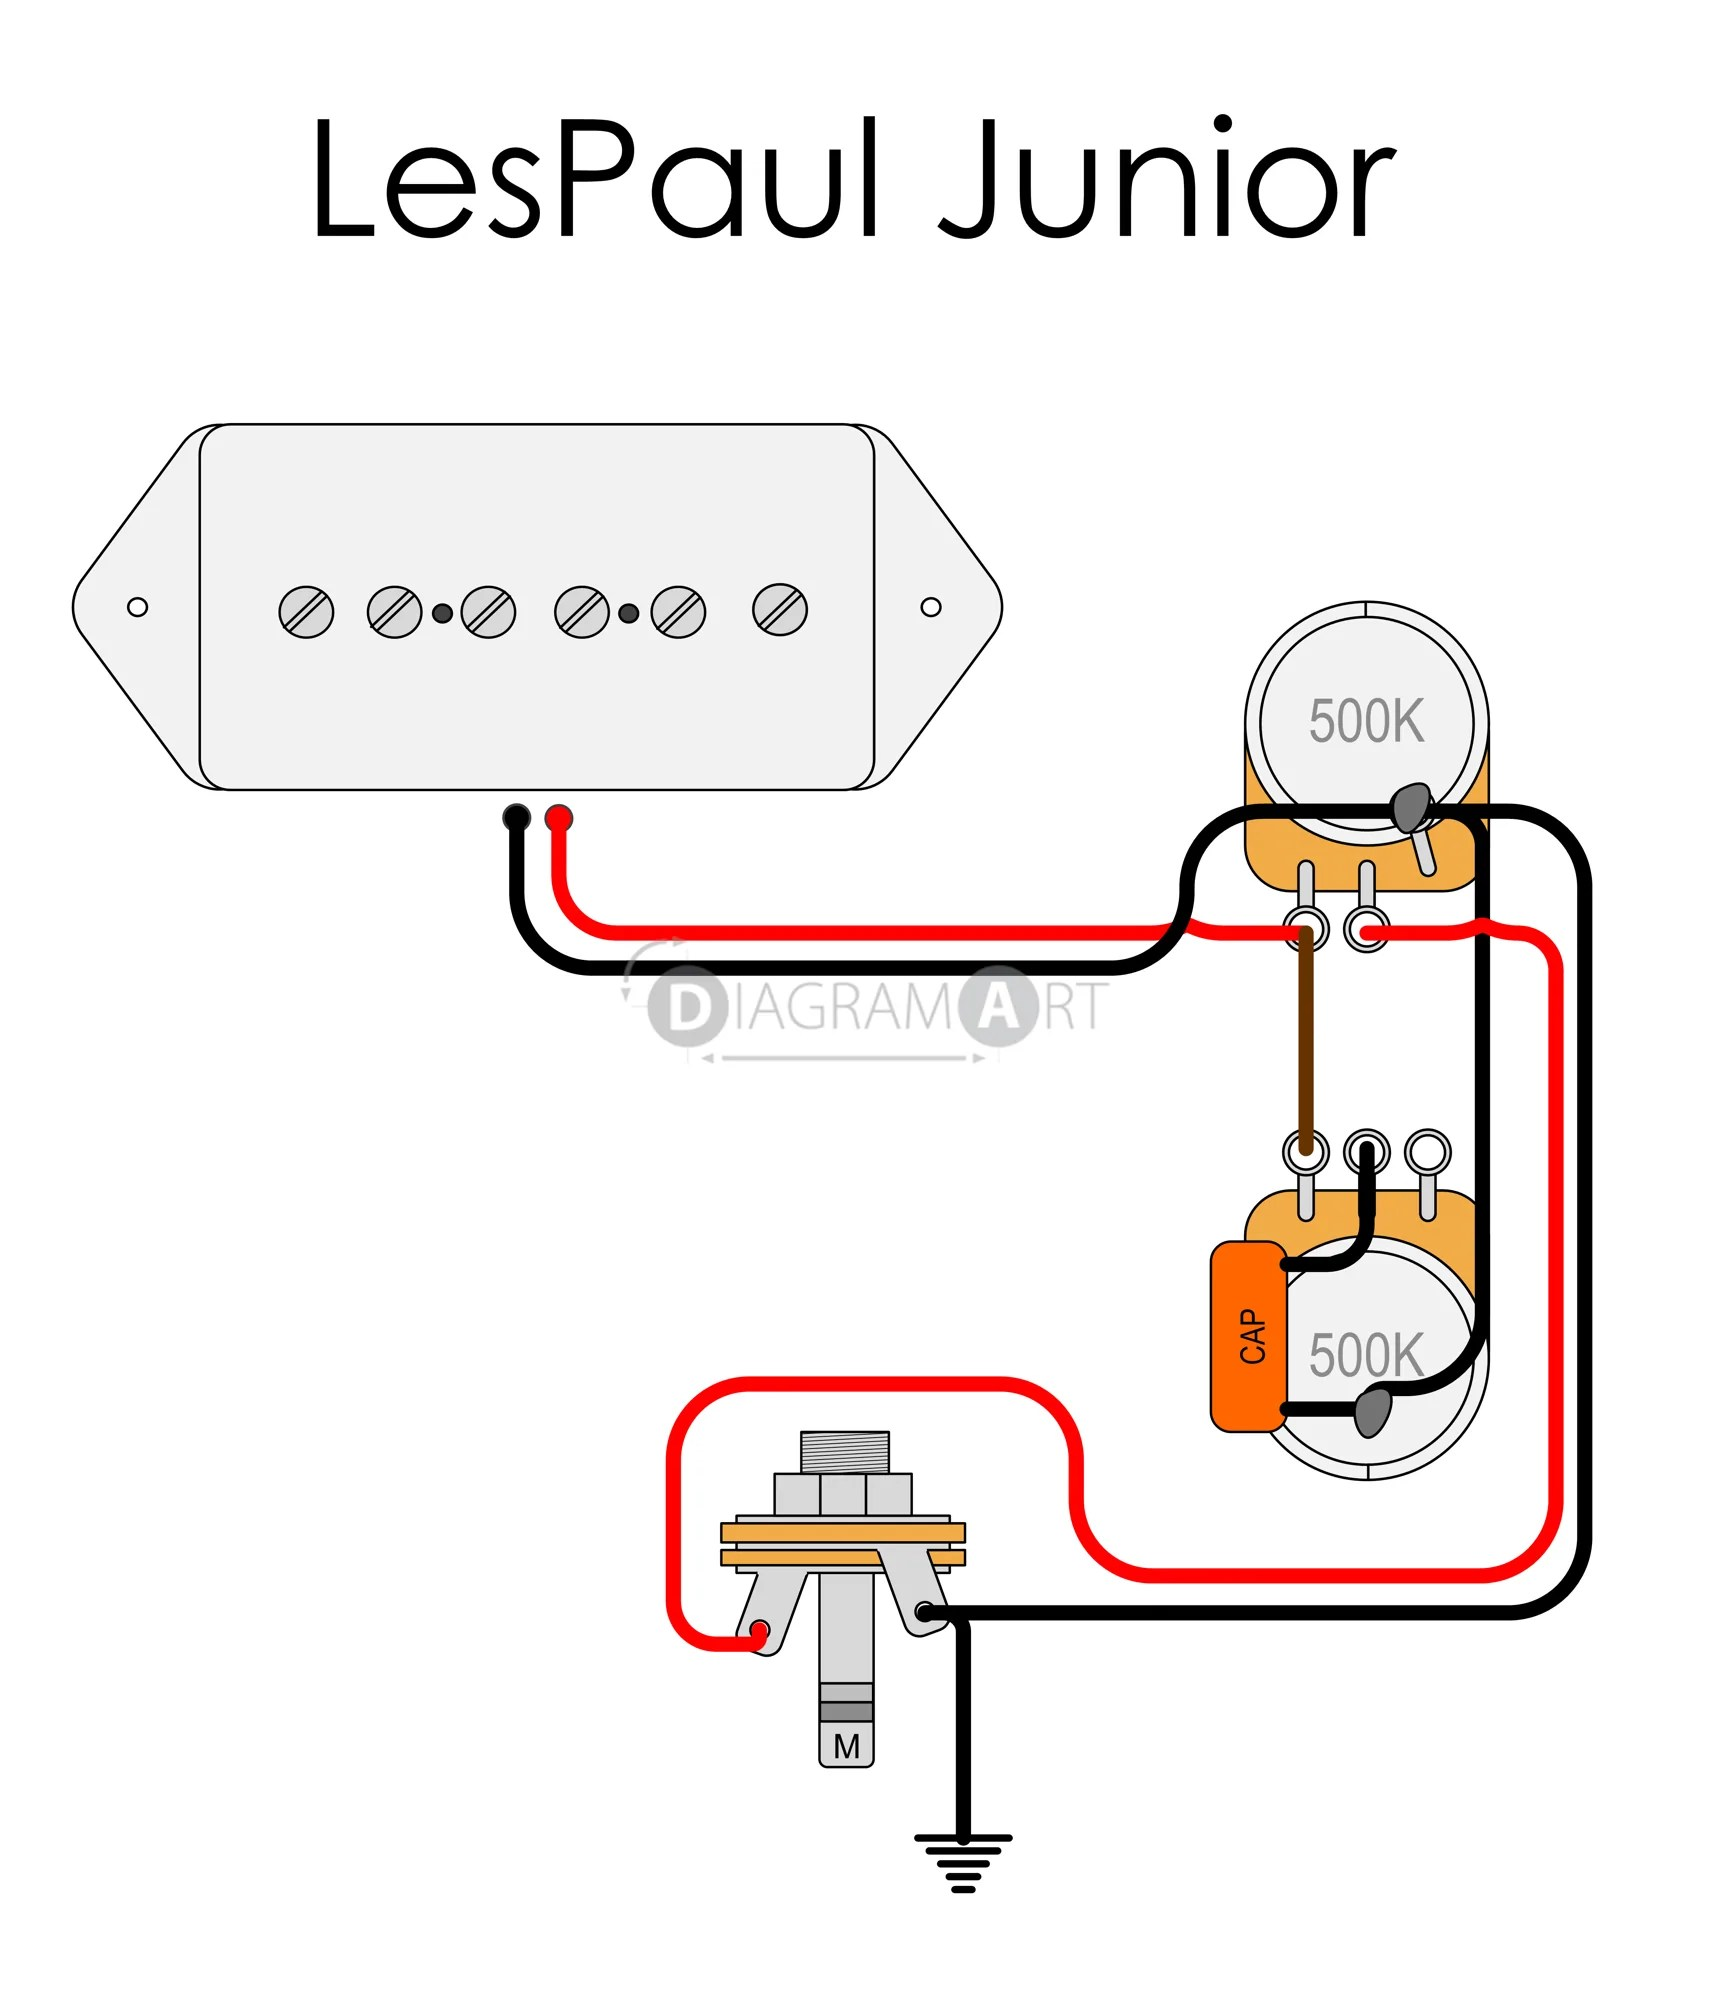 electric guitars wiring diagrams schema wiring diagram wire diagram electric guitar wiring diagram name yamaha electric [ 1730 x 2000 Pixel ]